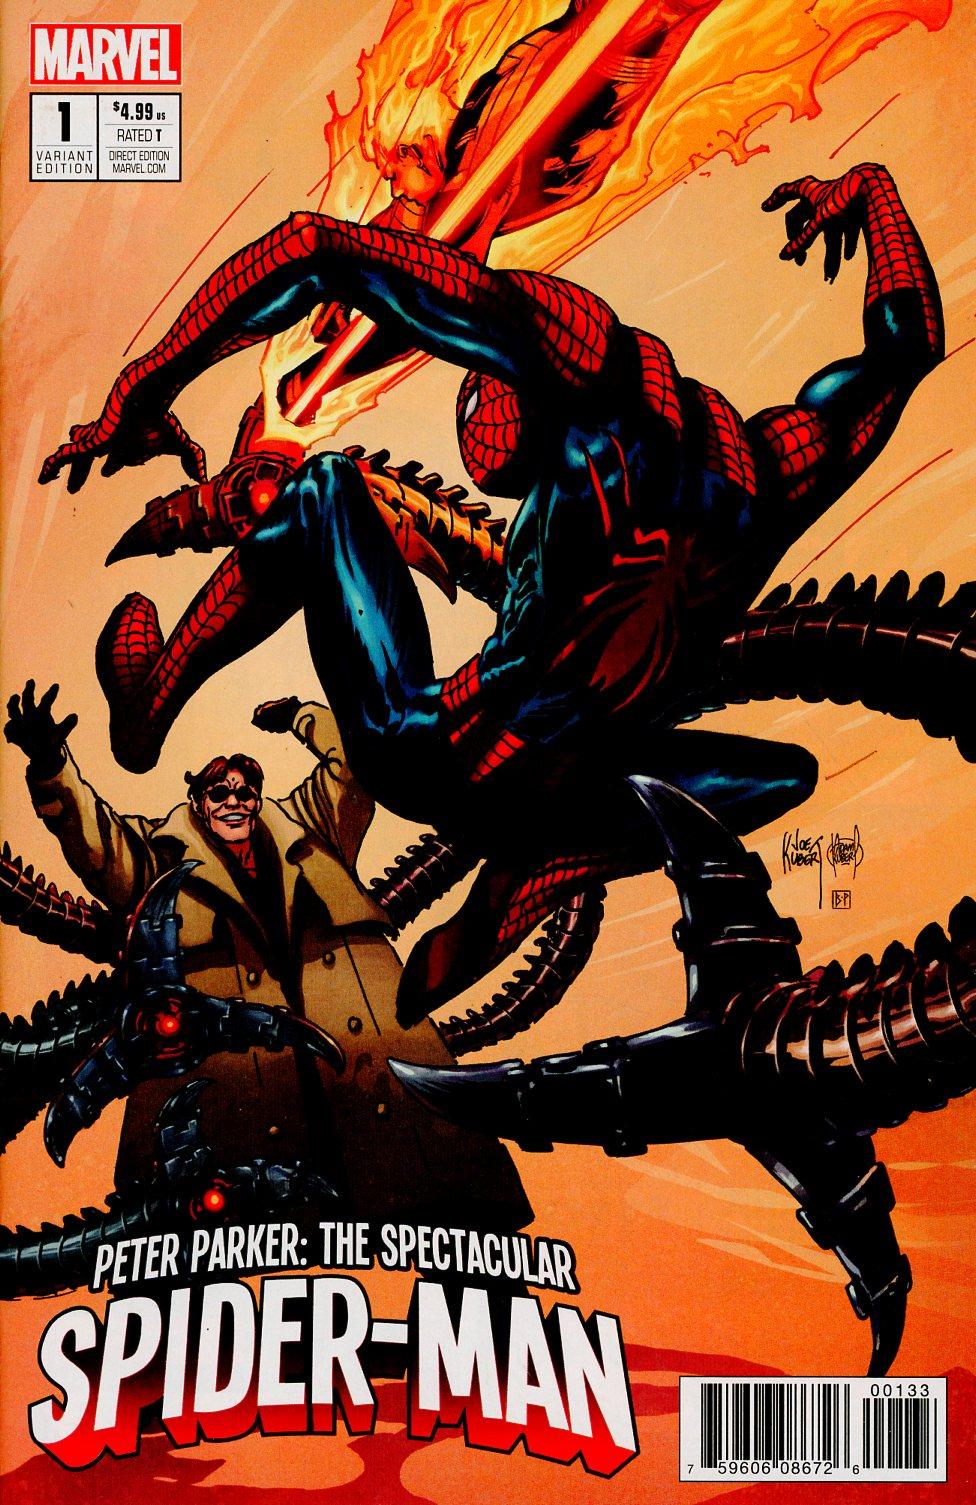 Peter Parker Spectacular Spider-Man #1 Cover S ComicSketchArt.com Exclusive Joe Kubert & Adam Kubert Color Variant Cover